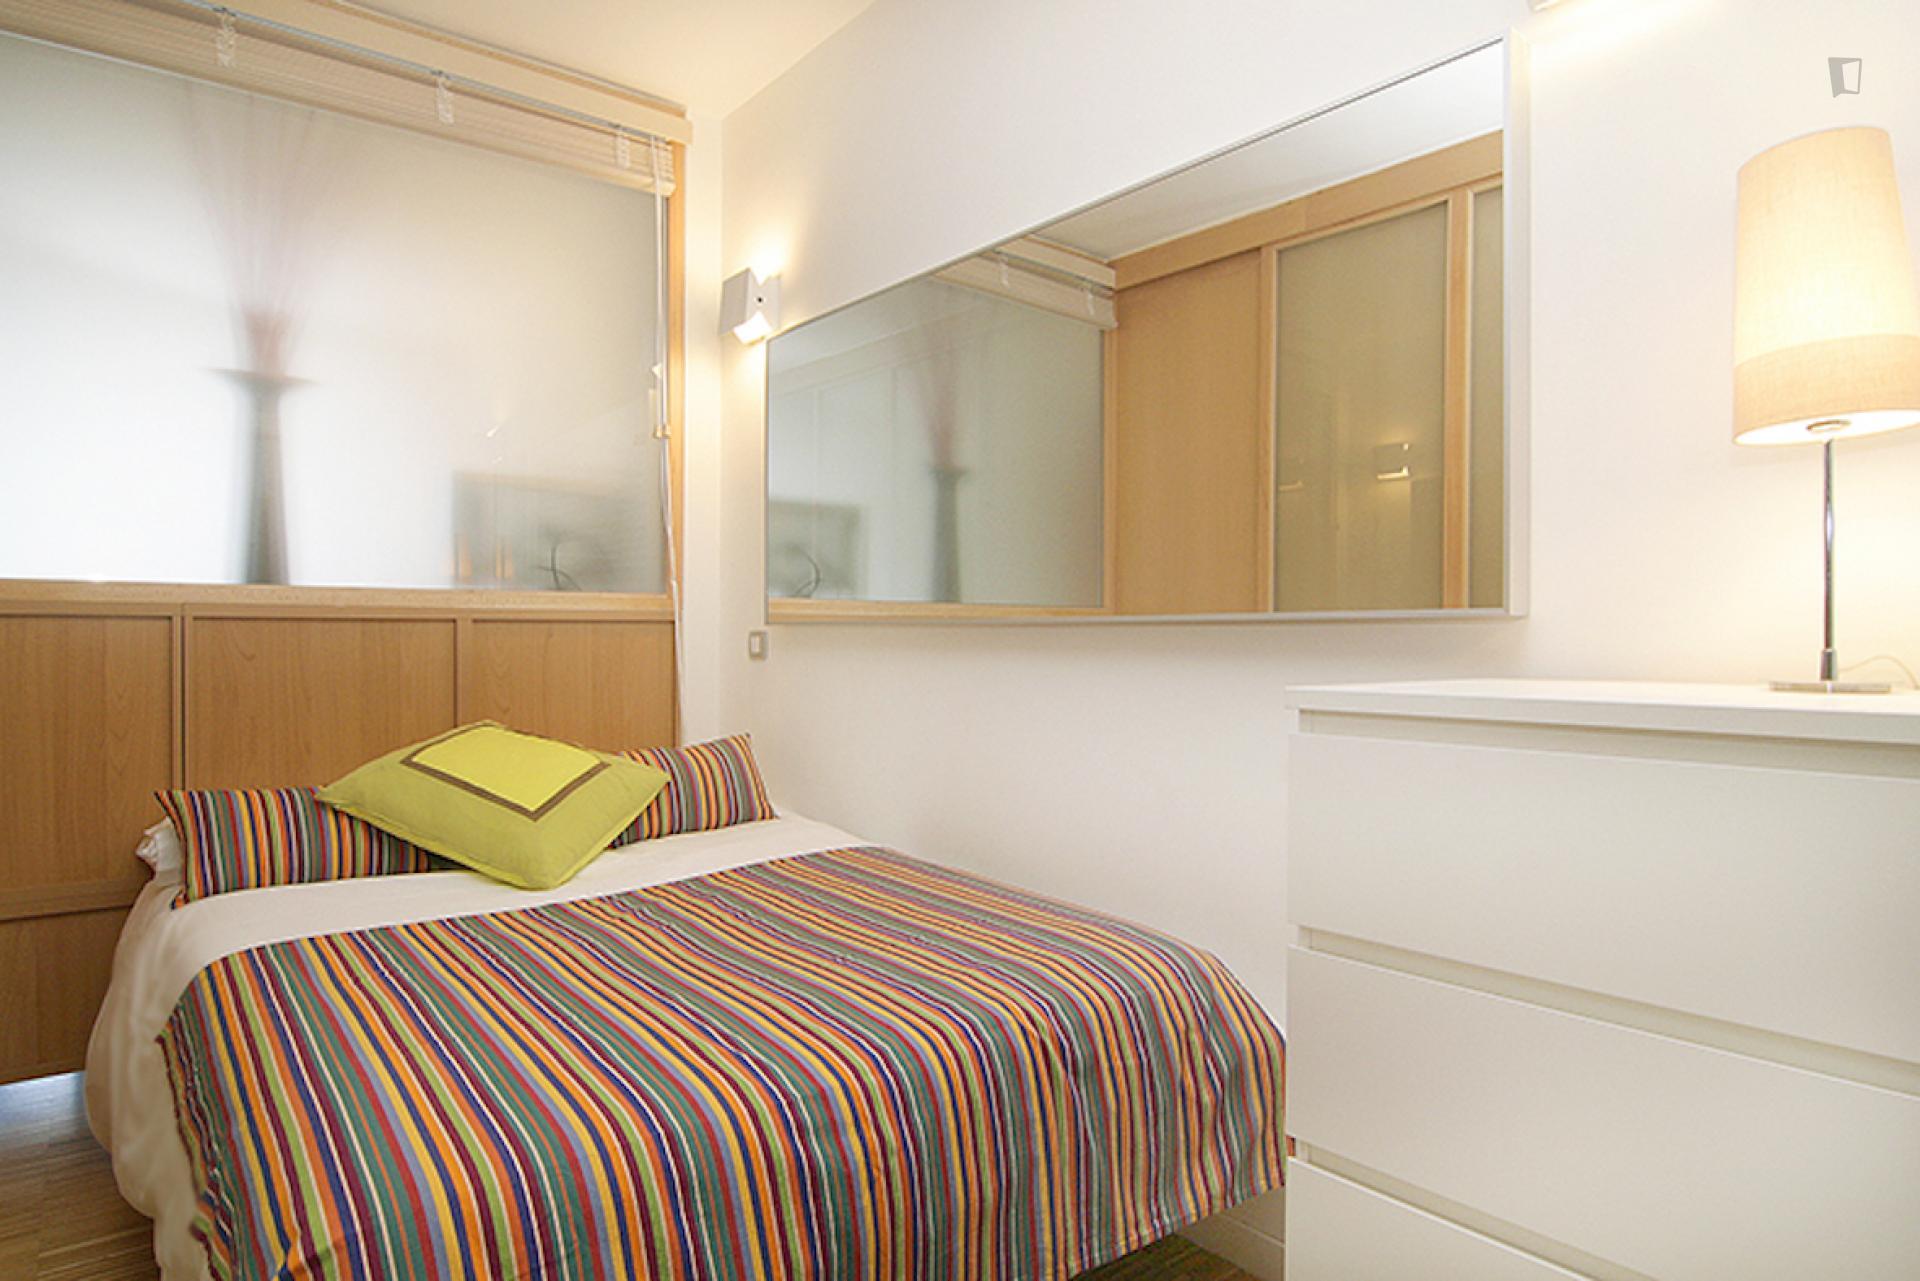 Tirso - 2 bedroom flat in Madrid centre